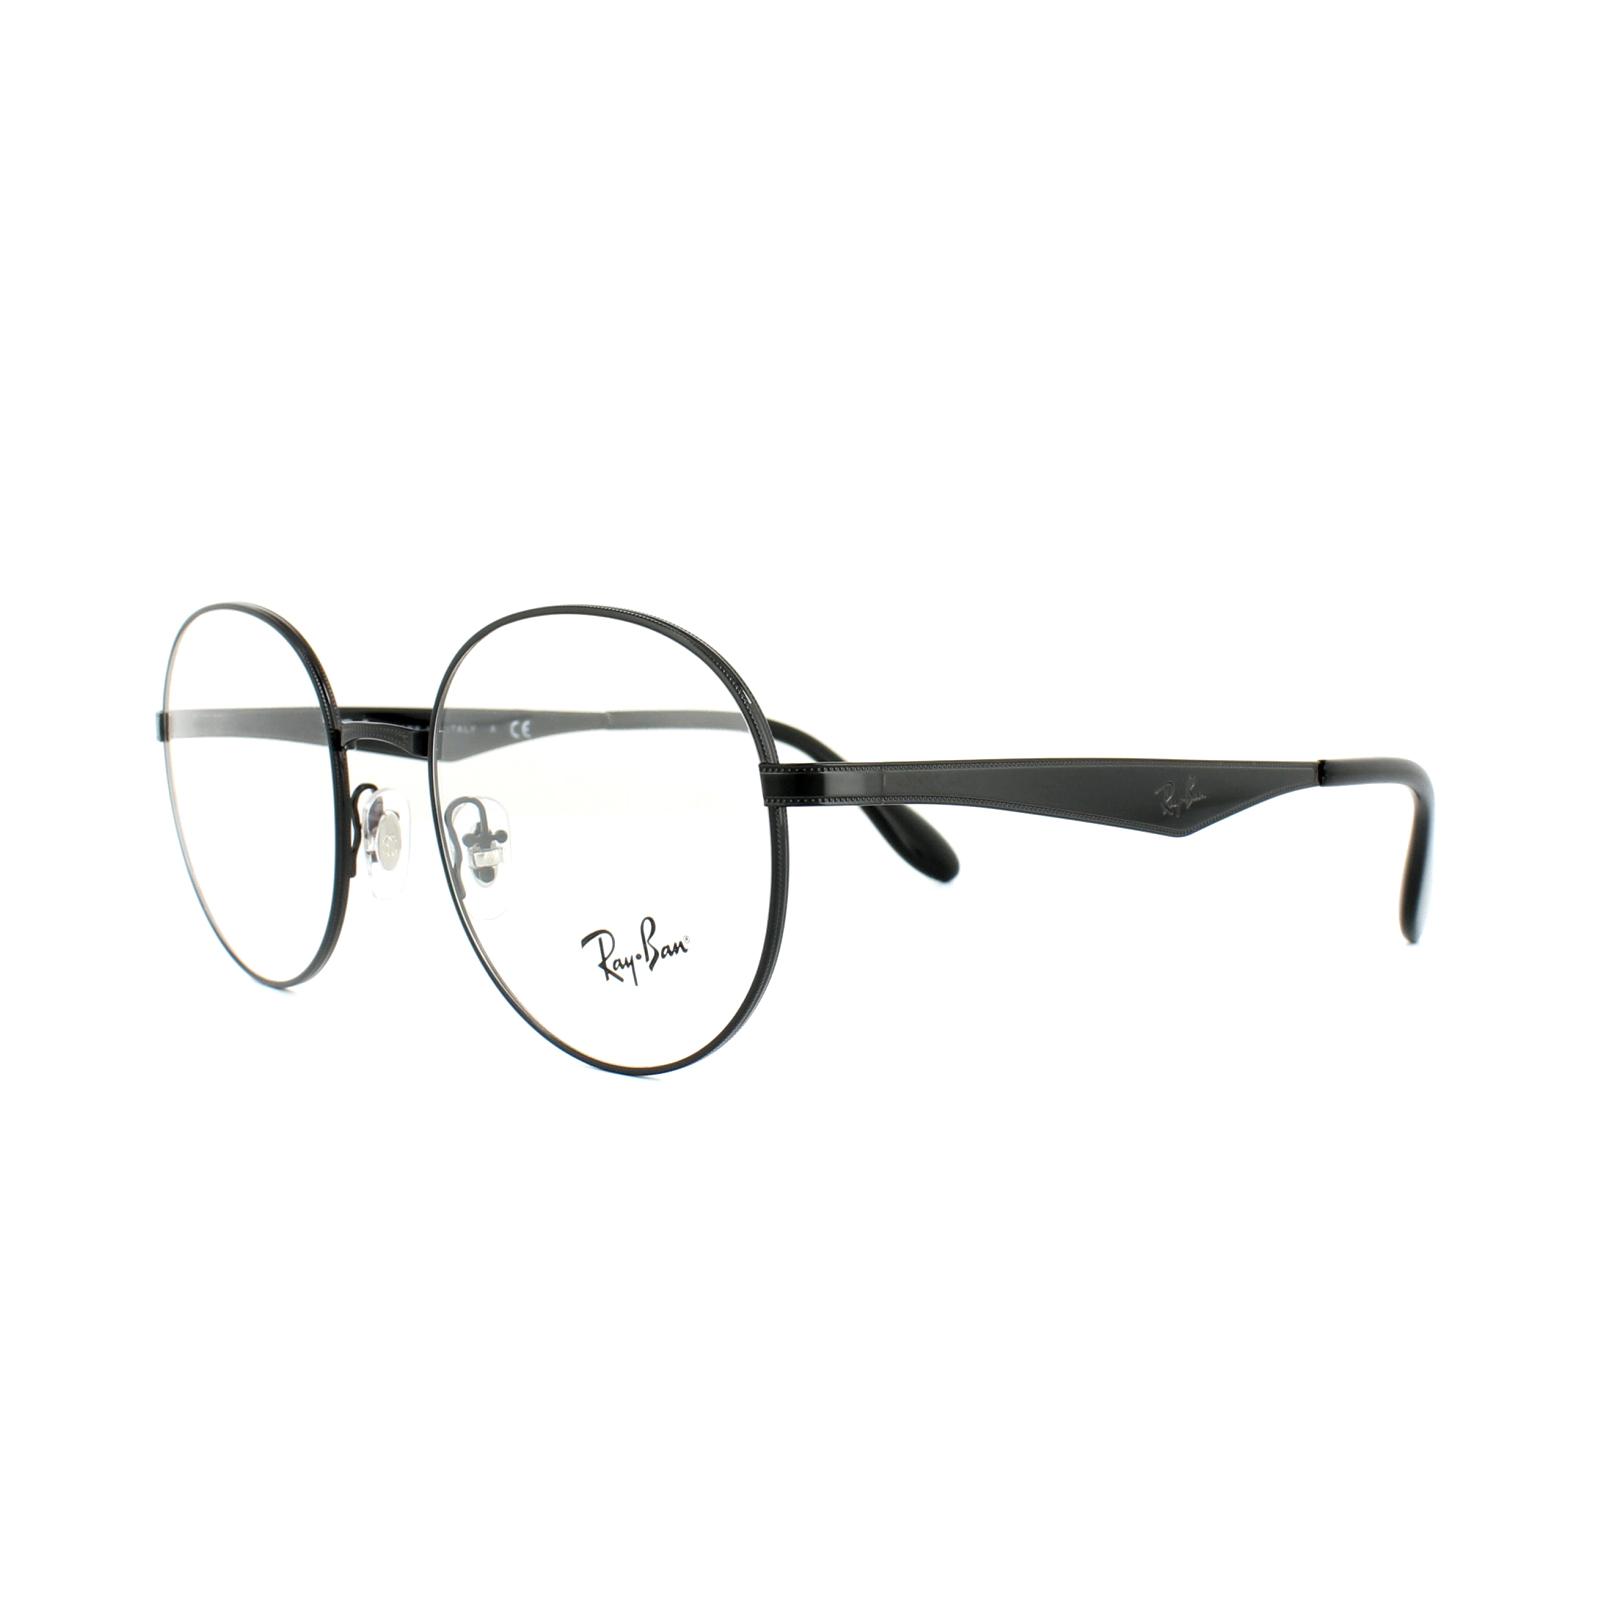 0aac8959e587 Sentinel Ray-Ban Glasses Frames RX 6343 2509 Shiny Black Mens 50mm